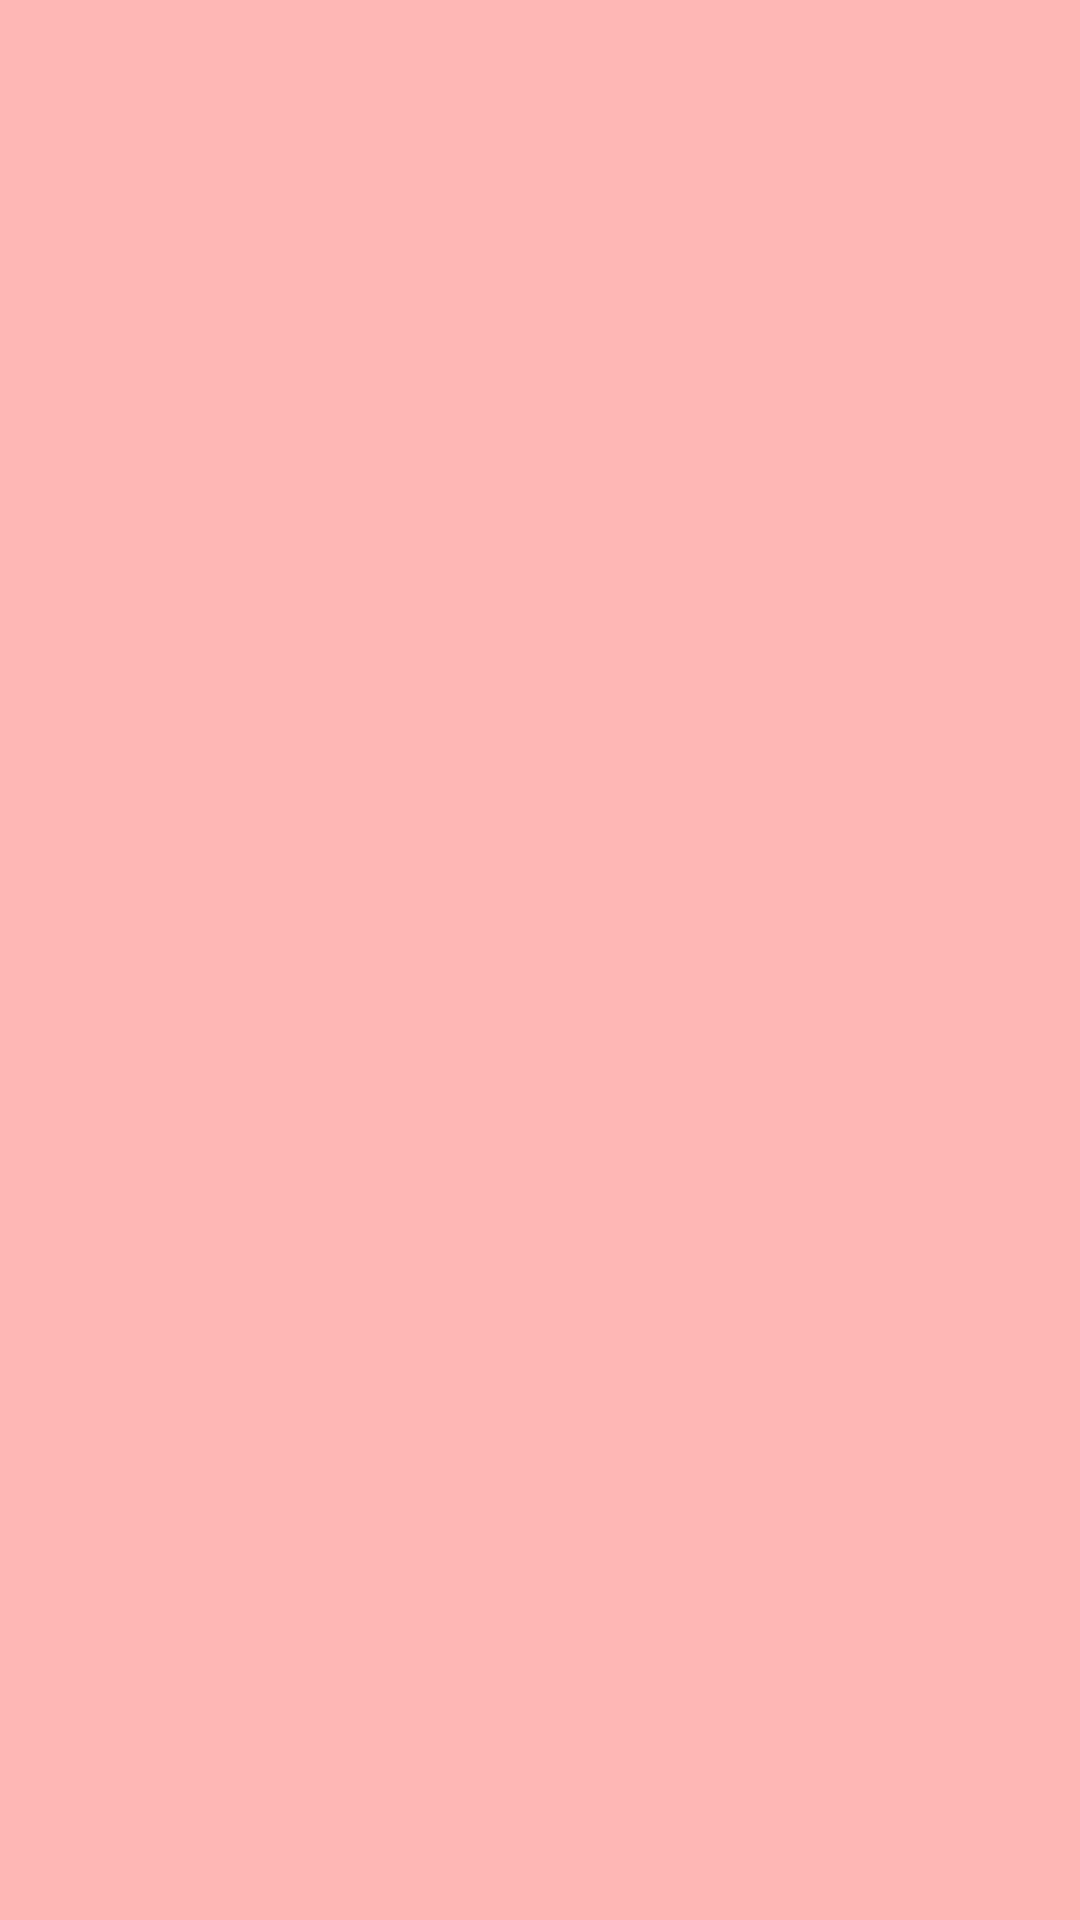 Res: 1080x1920, ffb7b6 Solid color image https://www.solidcolore.com/ffb7b6.htm #solid #color  wallpaper #Background | https://www.solidcolore.com/ffb7b6.htm